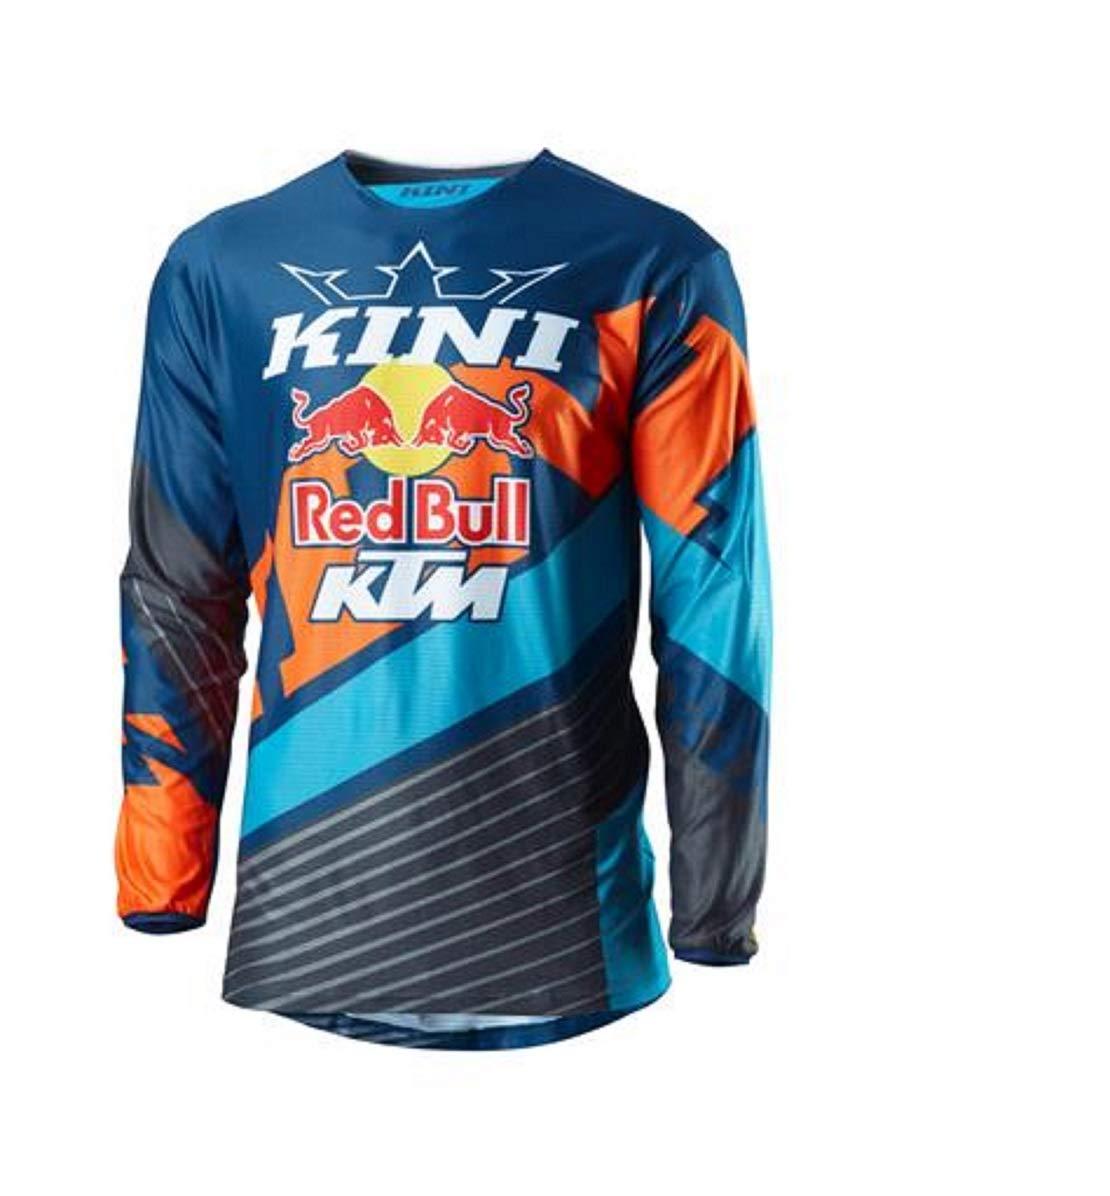 NEW KTM KINI-RB COMPETITION SHIRT 3KI20000450X XL